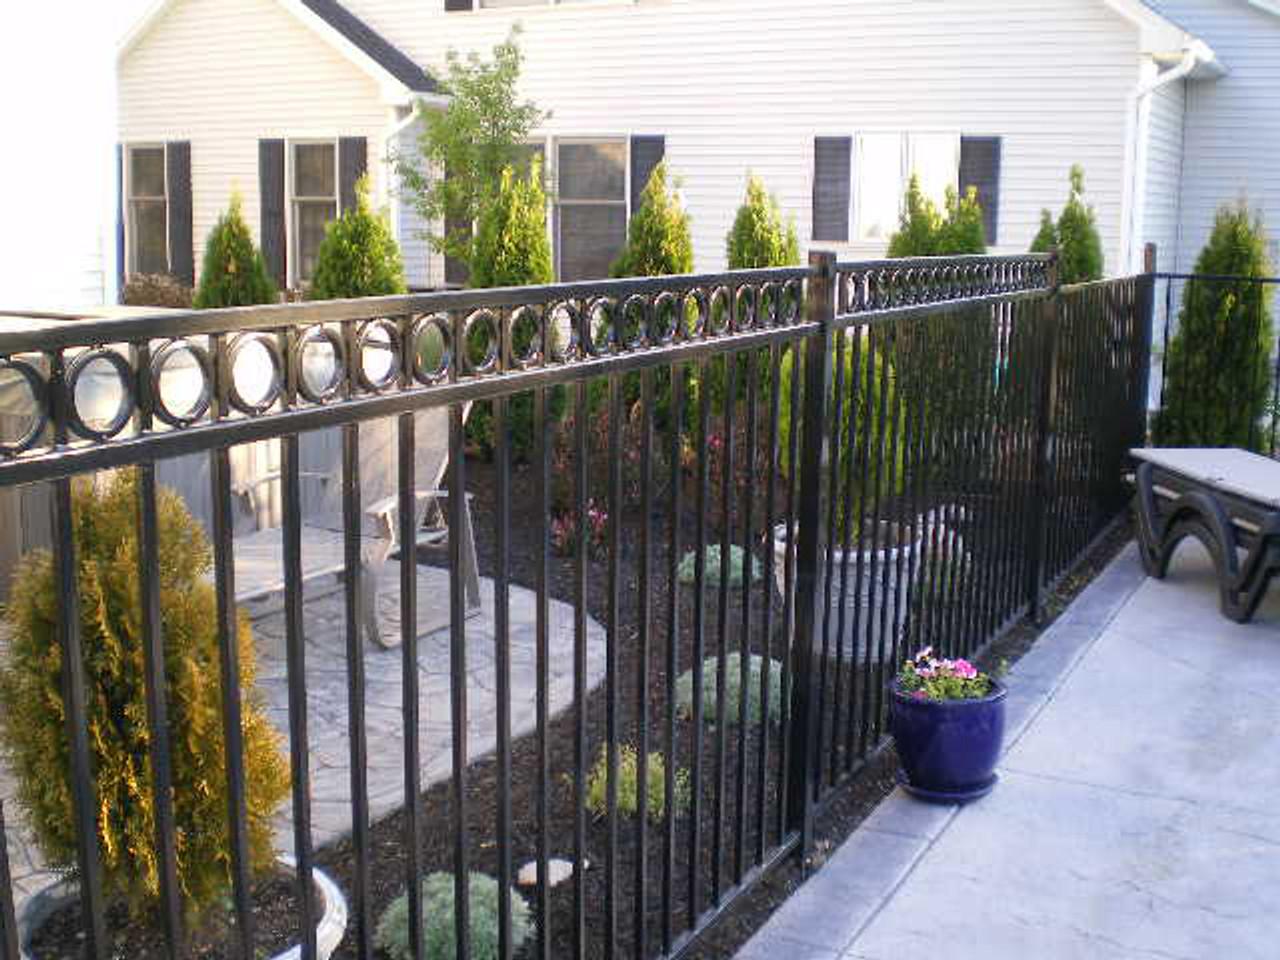 Ornamental Fence Installed Using I2-600 OZ-POST Ornamental Post Anchors